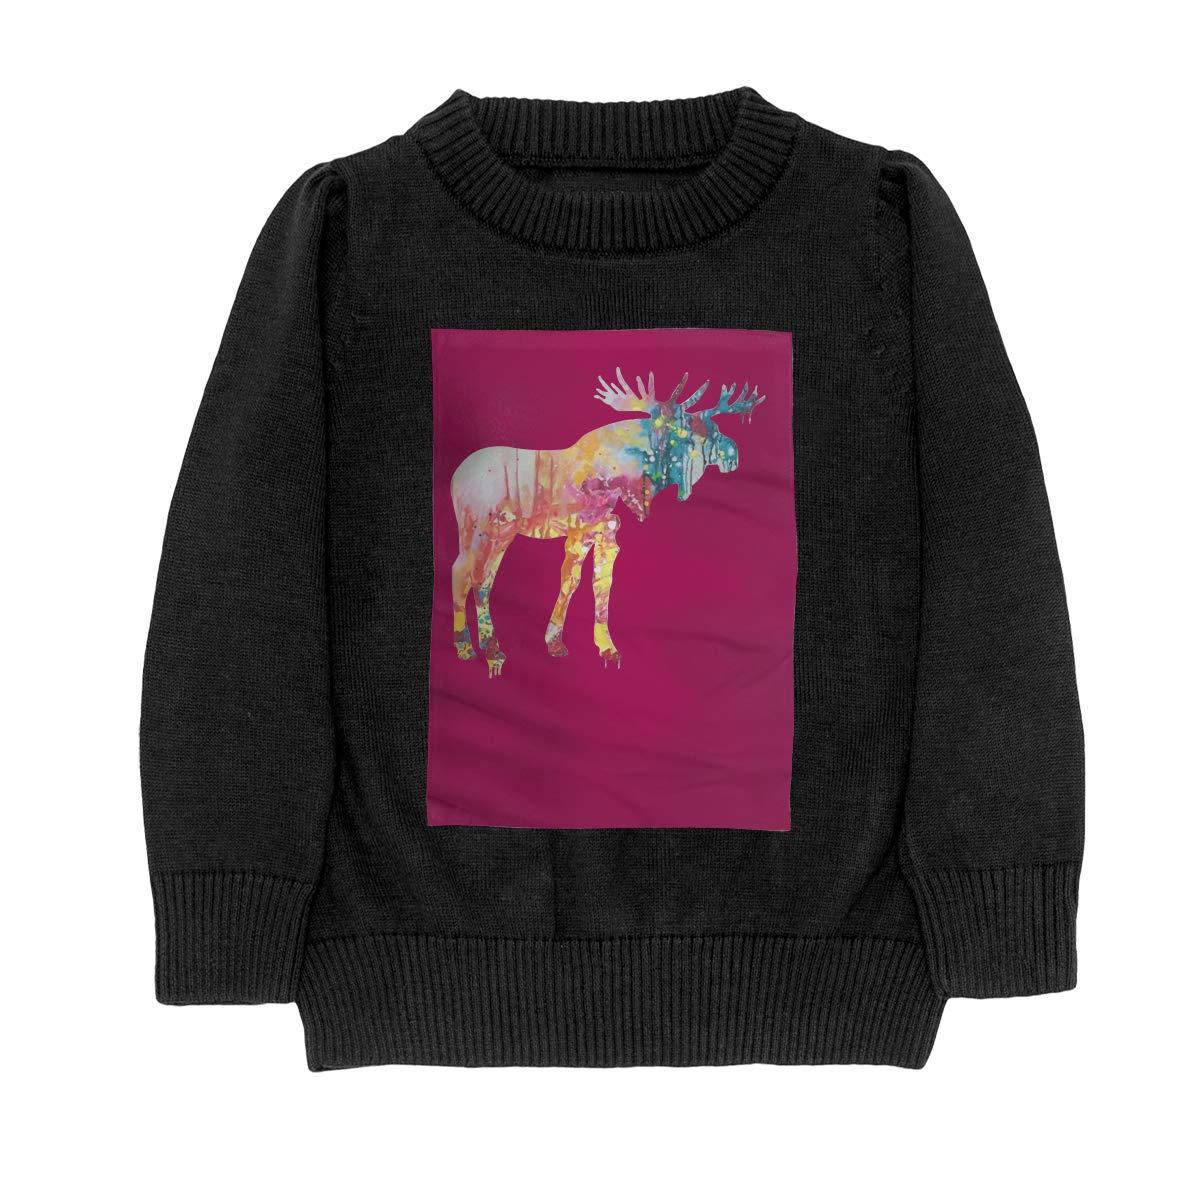 WWTBBJ-B Splatter Moose Style Adolescent Boys Girls Unisex Sweater Keep Warm